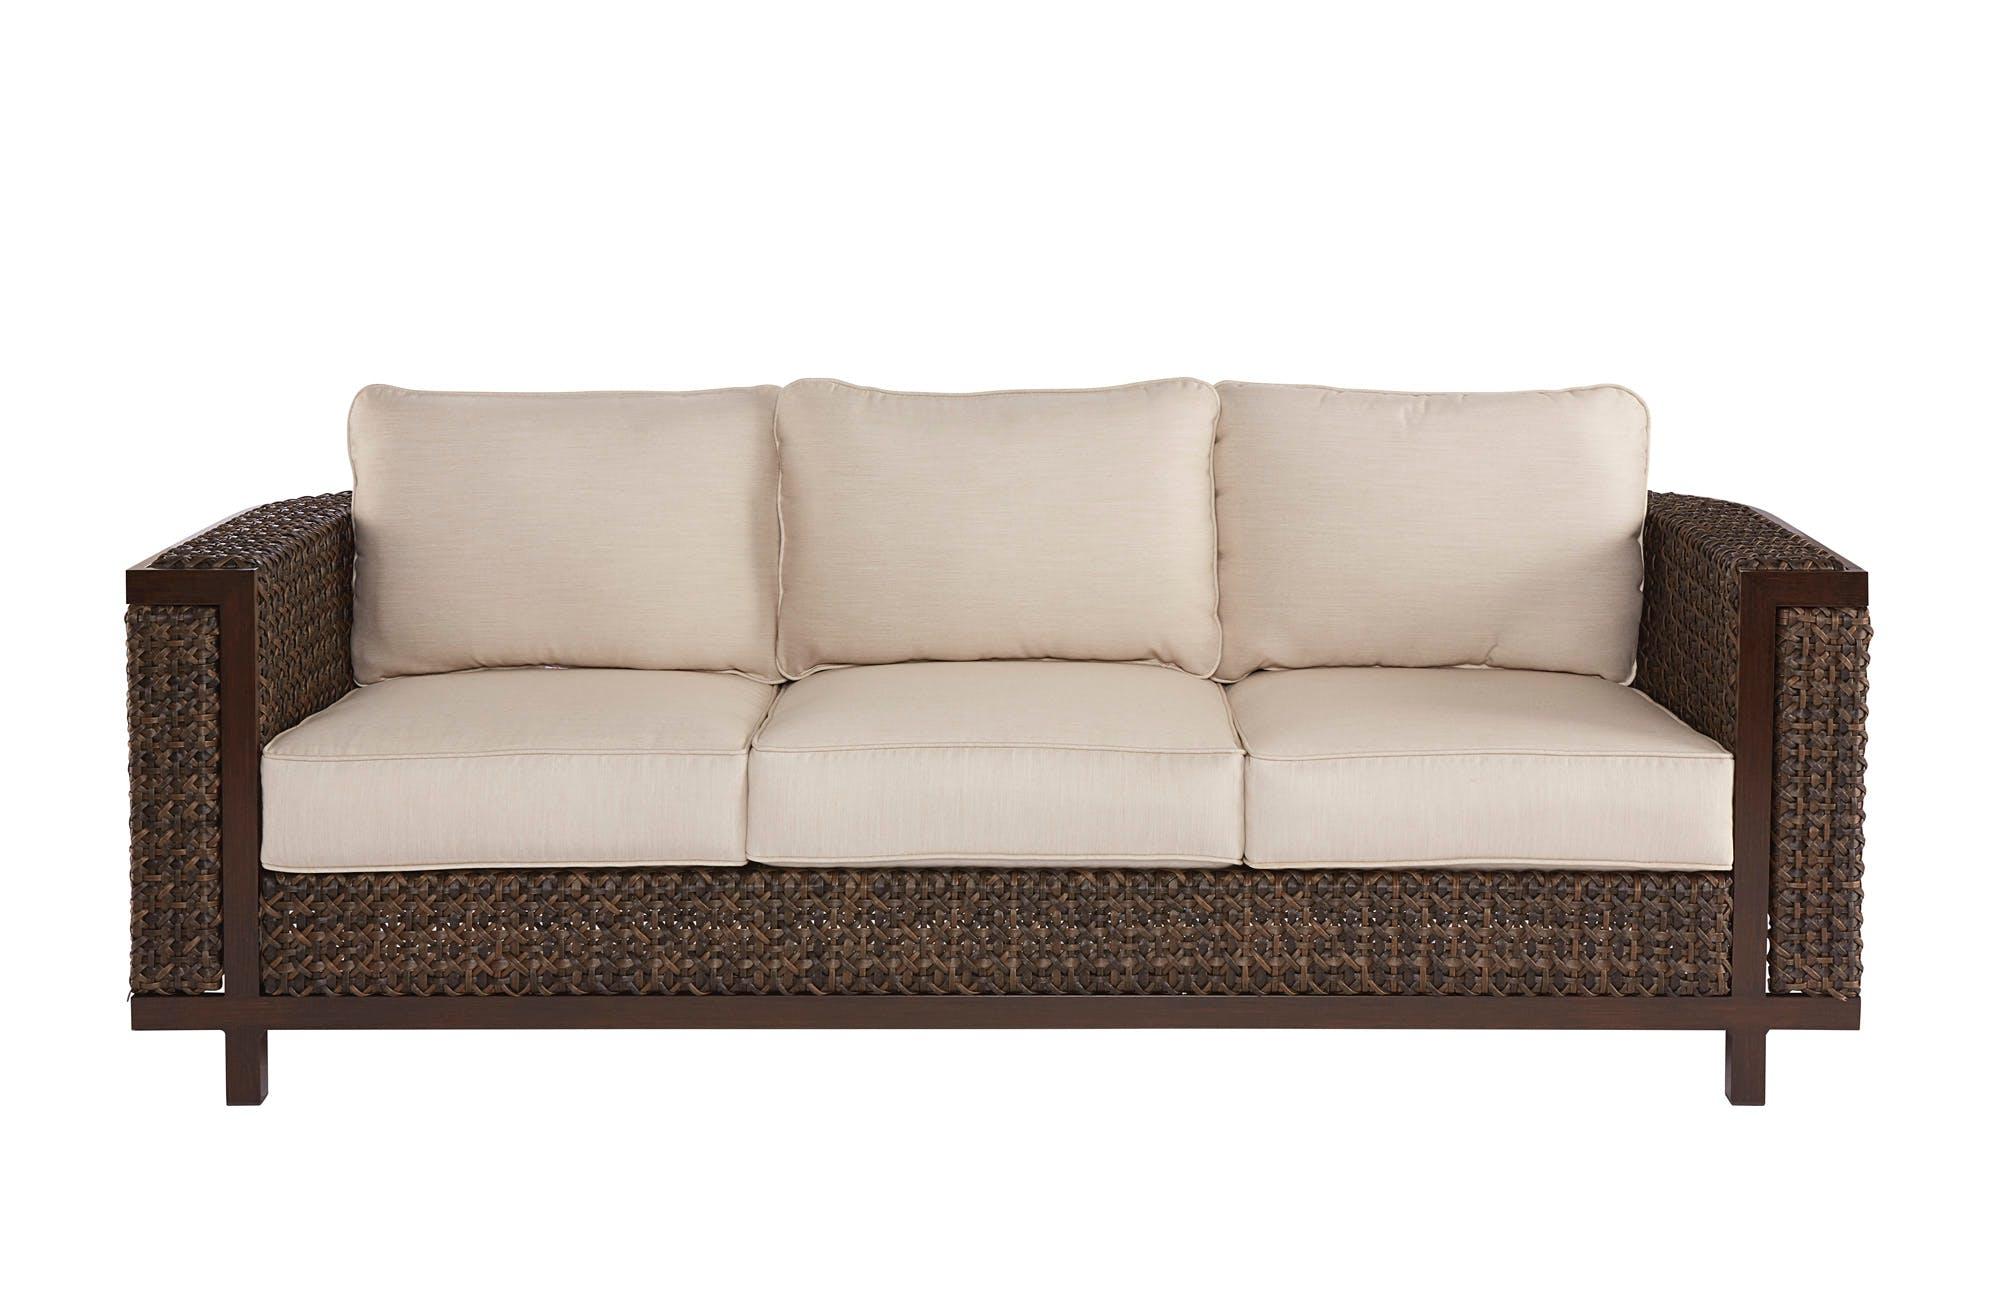 art furniture brentwood wicker sofa 923501-4114 JGWCKZU